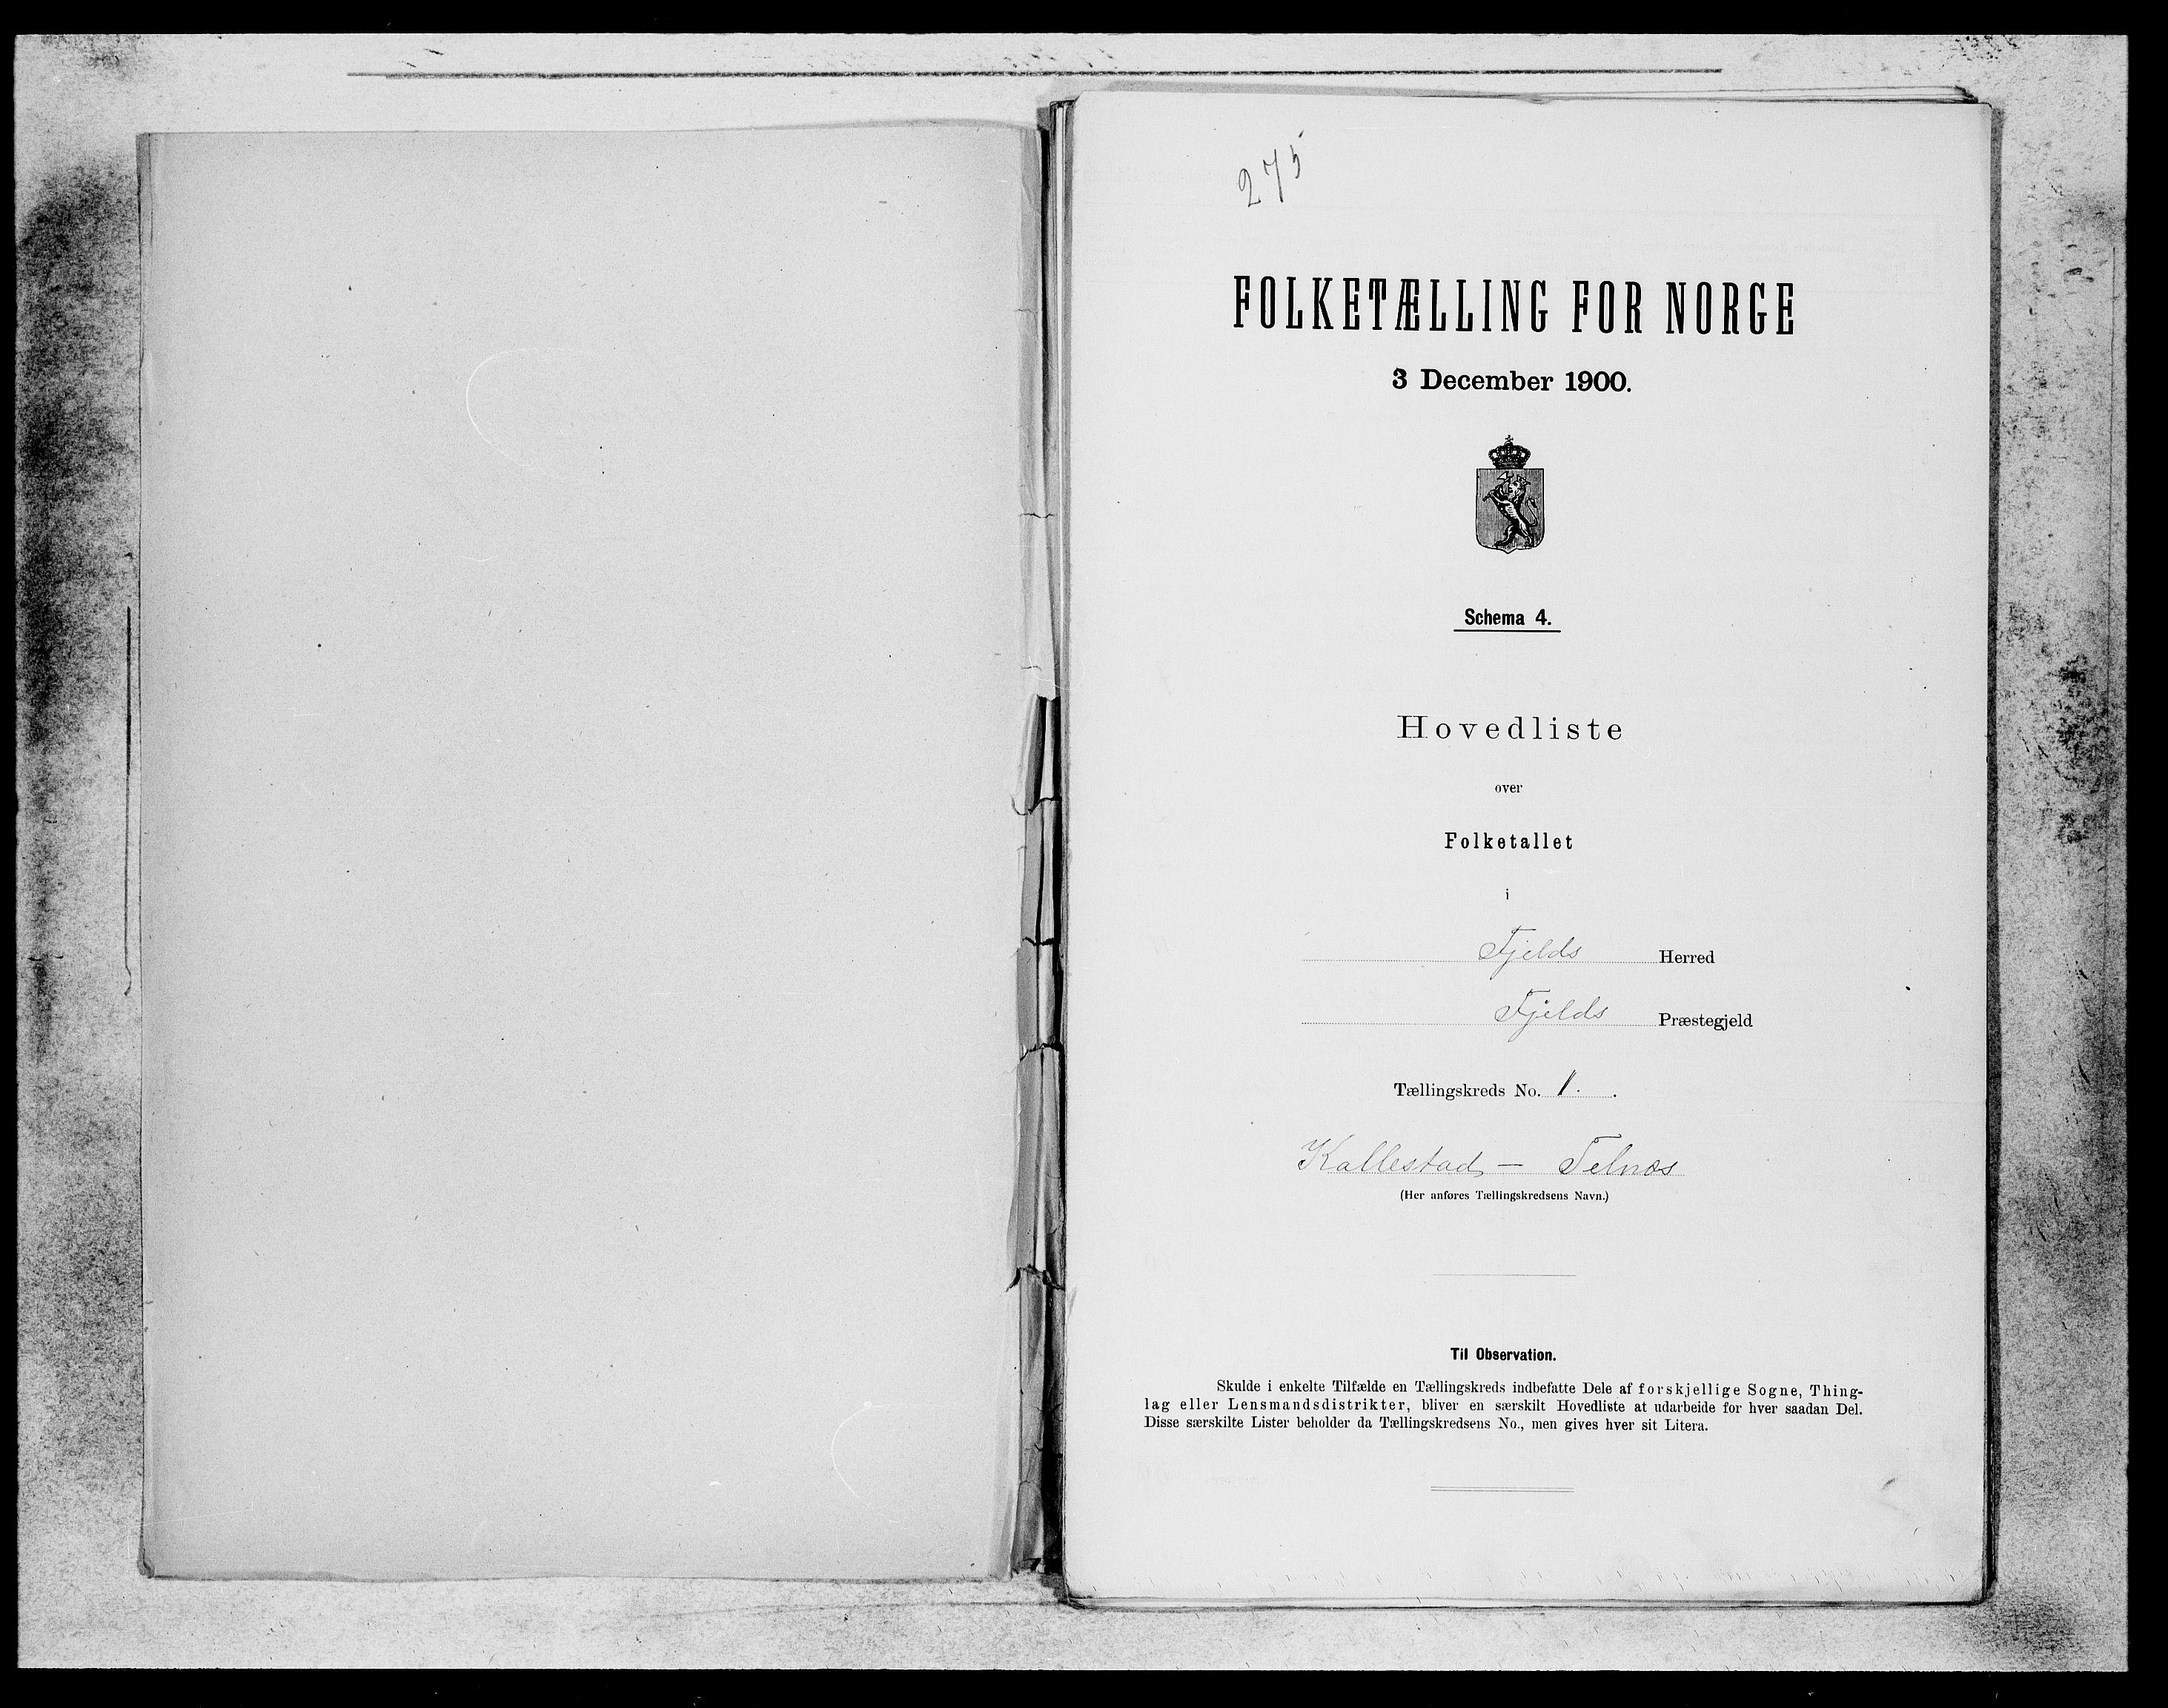 SAB, Folketelling 1900 for 1246 Fjell herred, 1900, s. 1